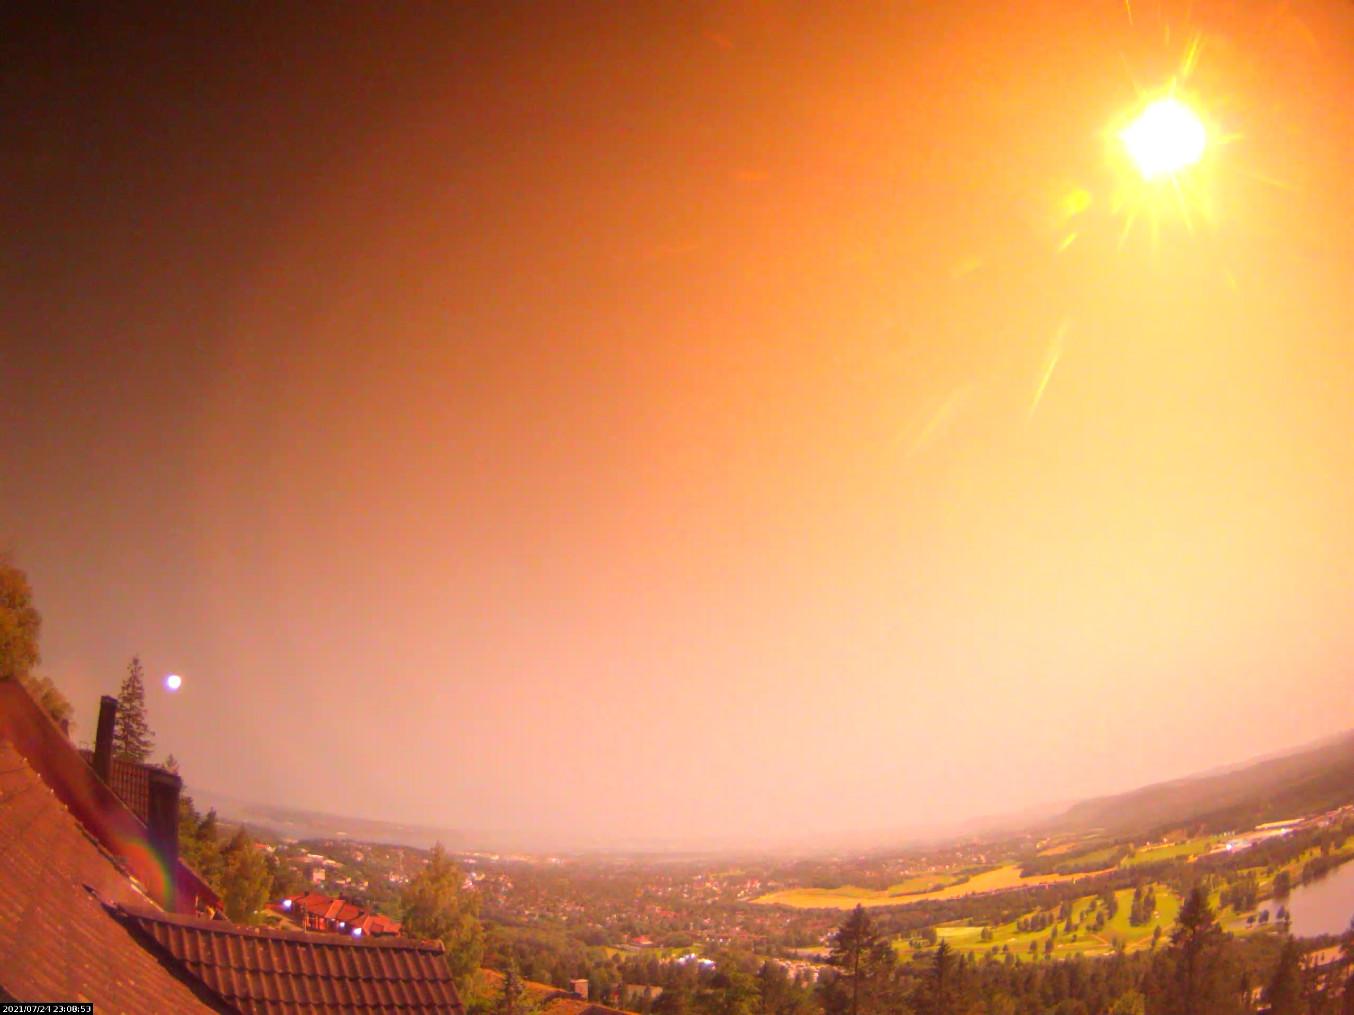 Недалеко от Осло в Норвегии в лес упал метеорит (видео)